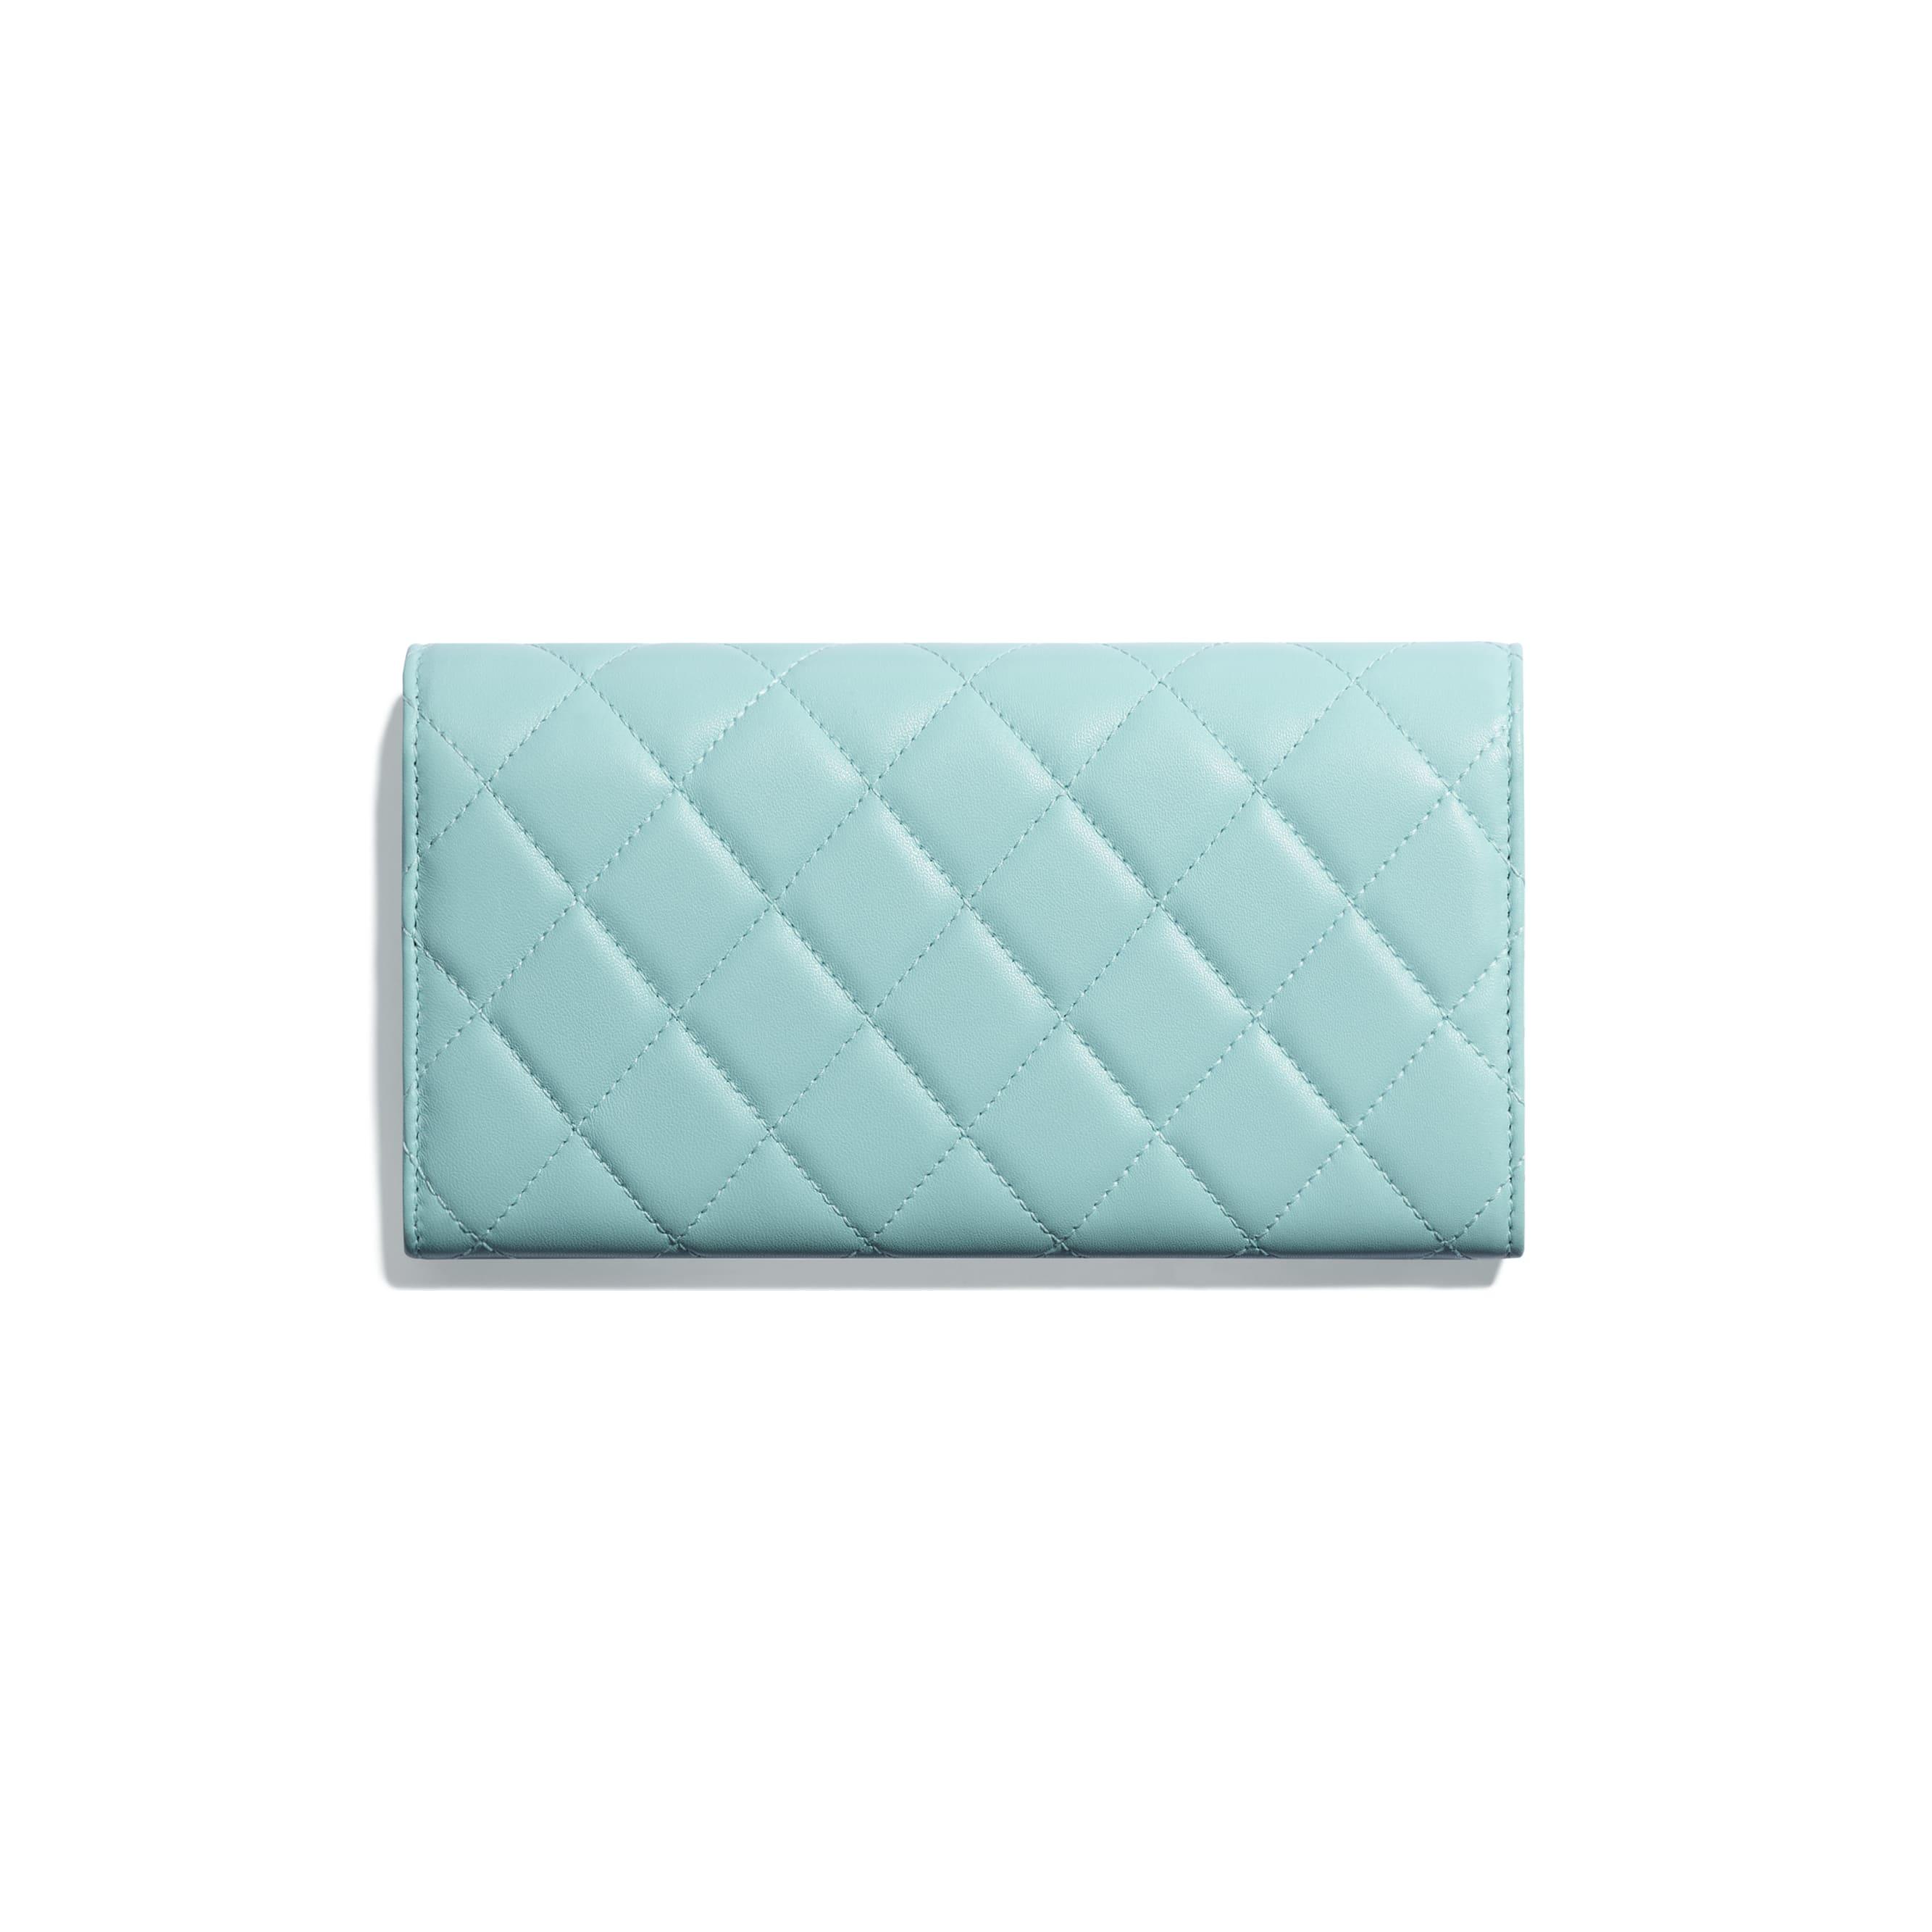 ... Classic Long Flap Wallet - Light Blue - Lambskin   Lacquered  Silver-Tone Metal - 1e558b89deb4f